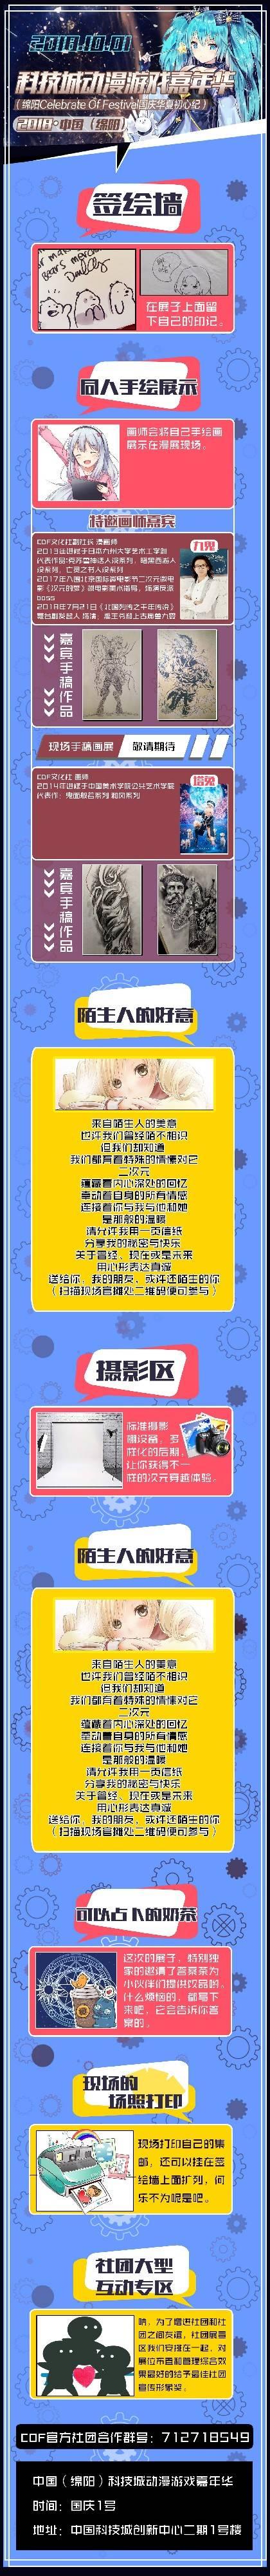 p9综合_看图王 (1).jpg